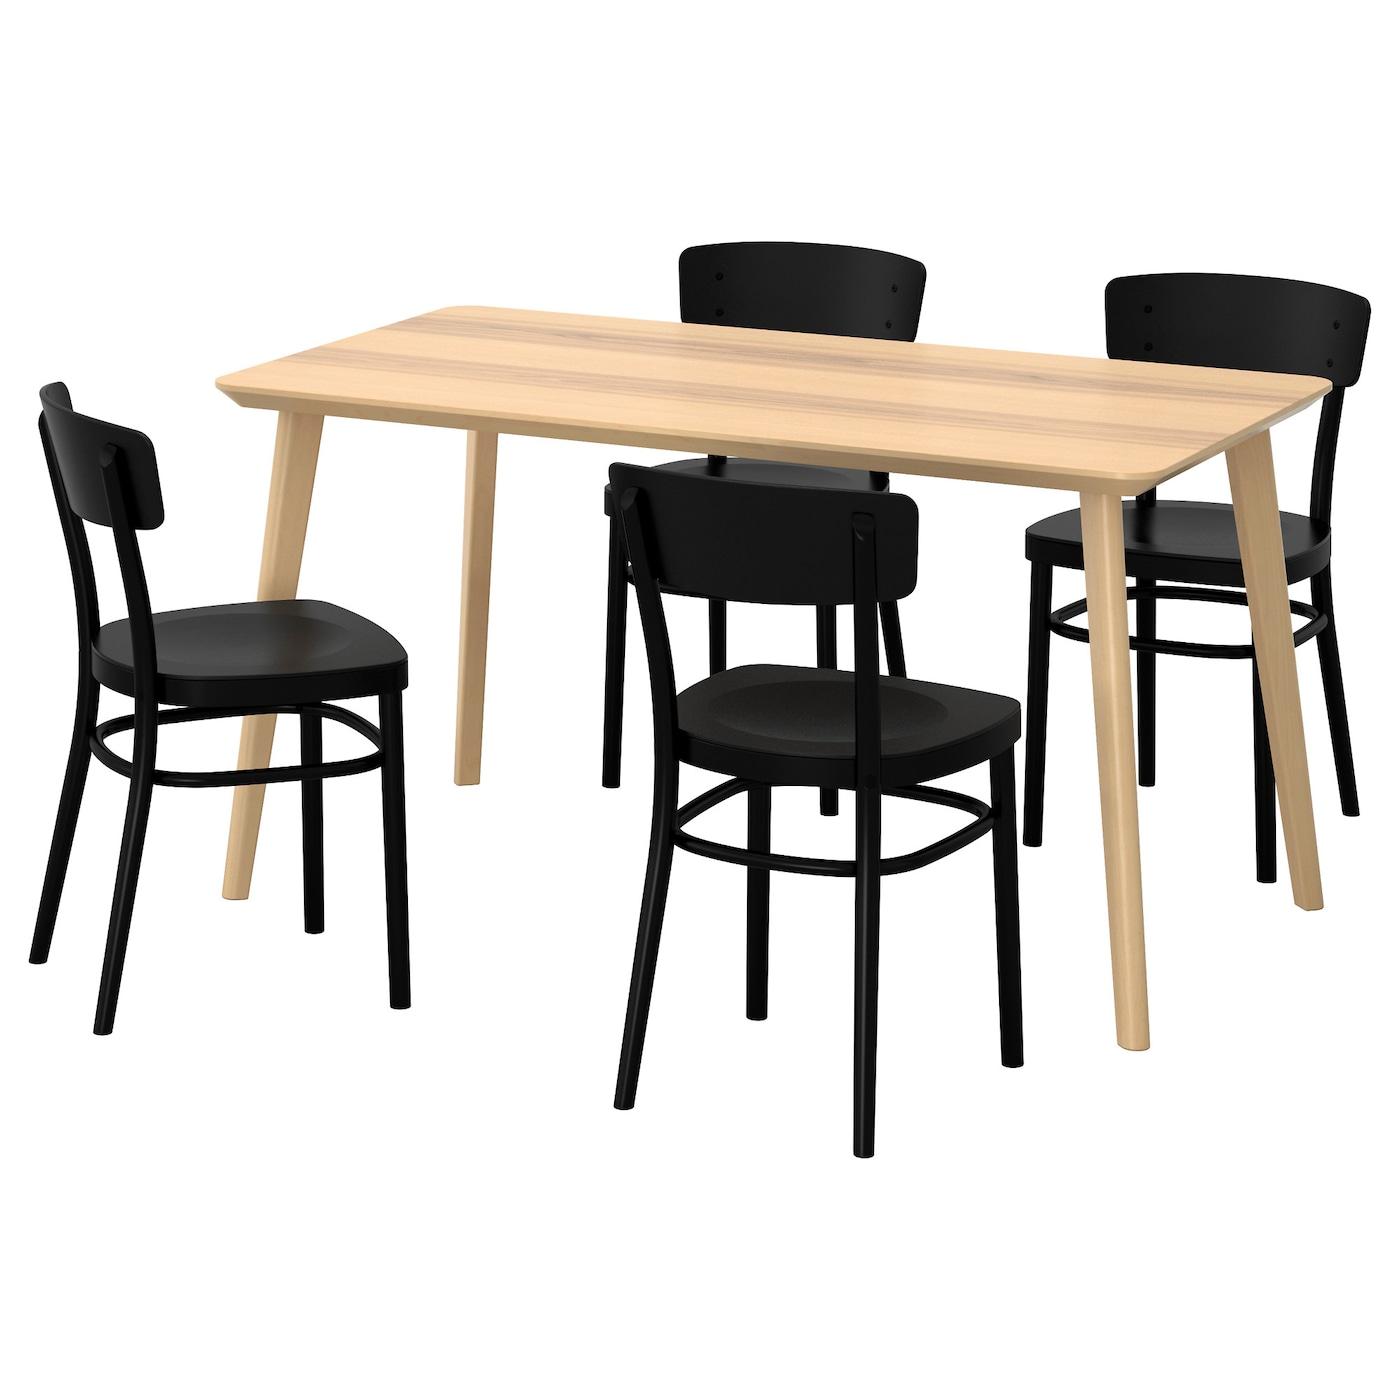 idolf lisabo table et 4 chaises plaqu fr ne noir 140 x 78 cm ikea. Black Bedroom Furniture Sets. Home Design Ideas